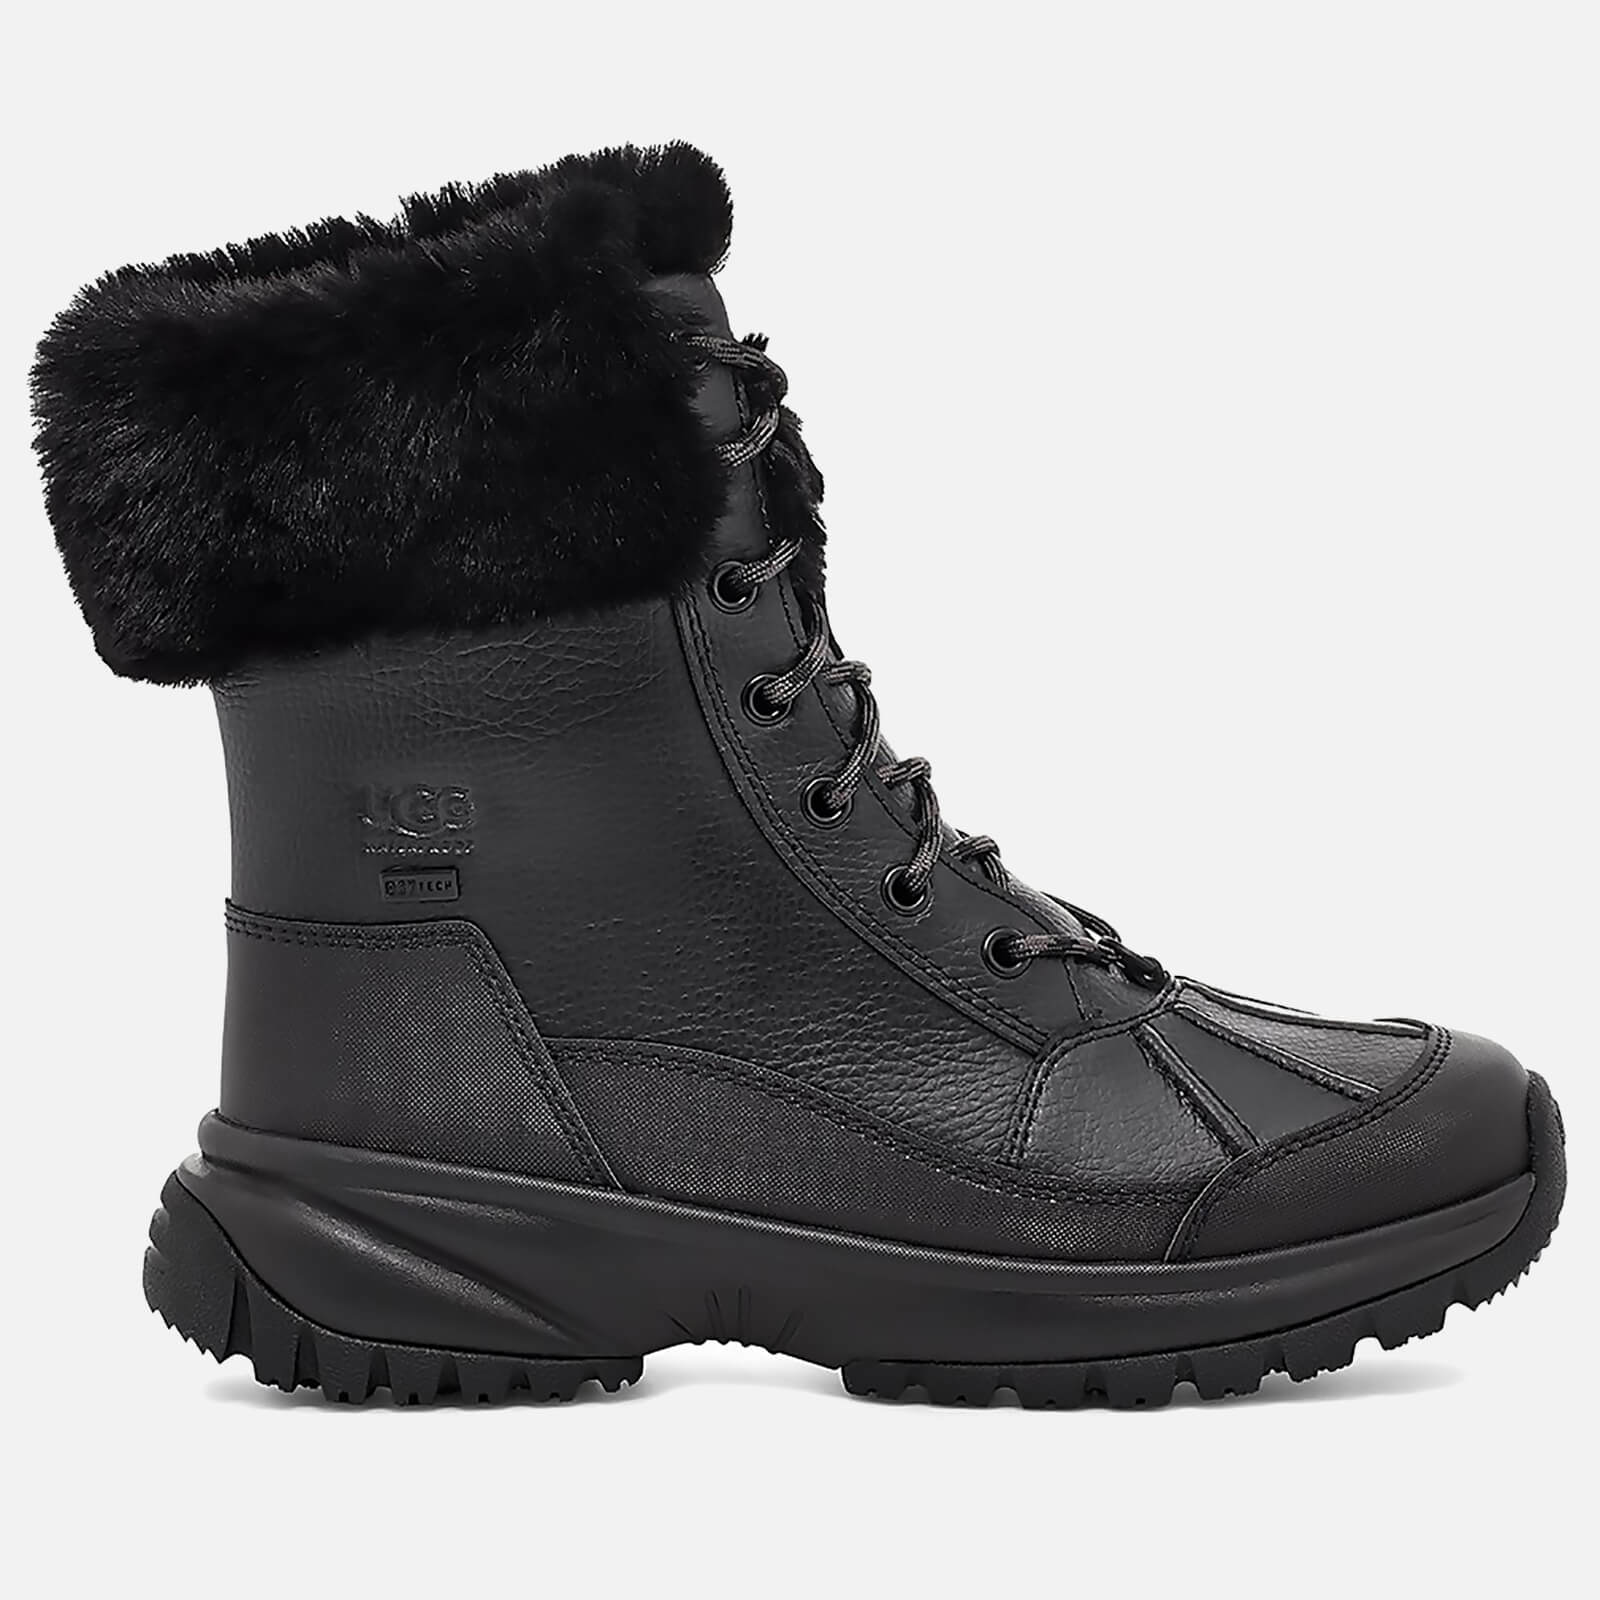 Ugg Women's Yose Fluff Waterproof Leather Snow Boots - Black - Uk 5